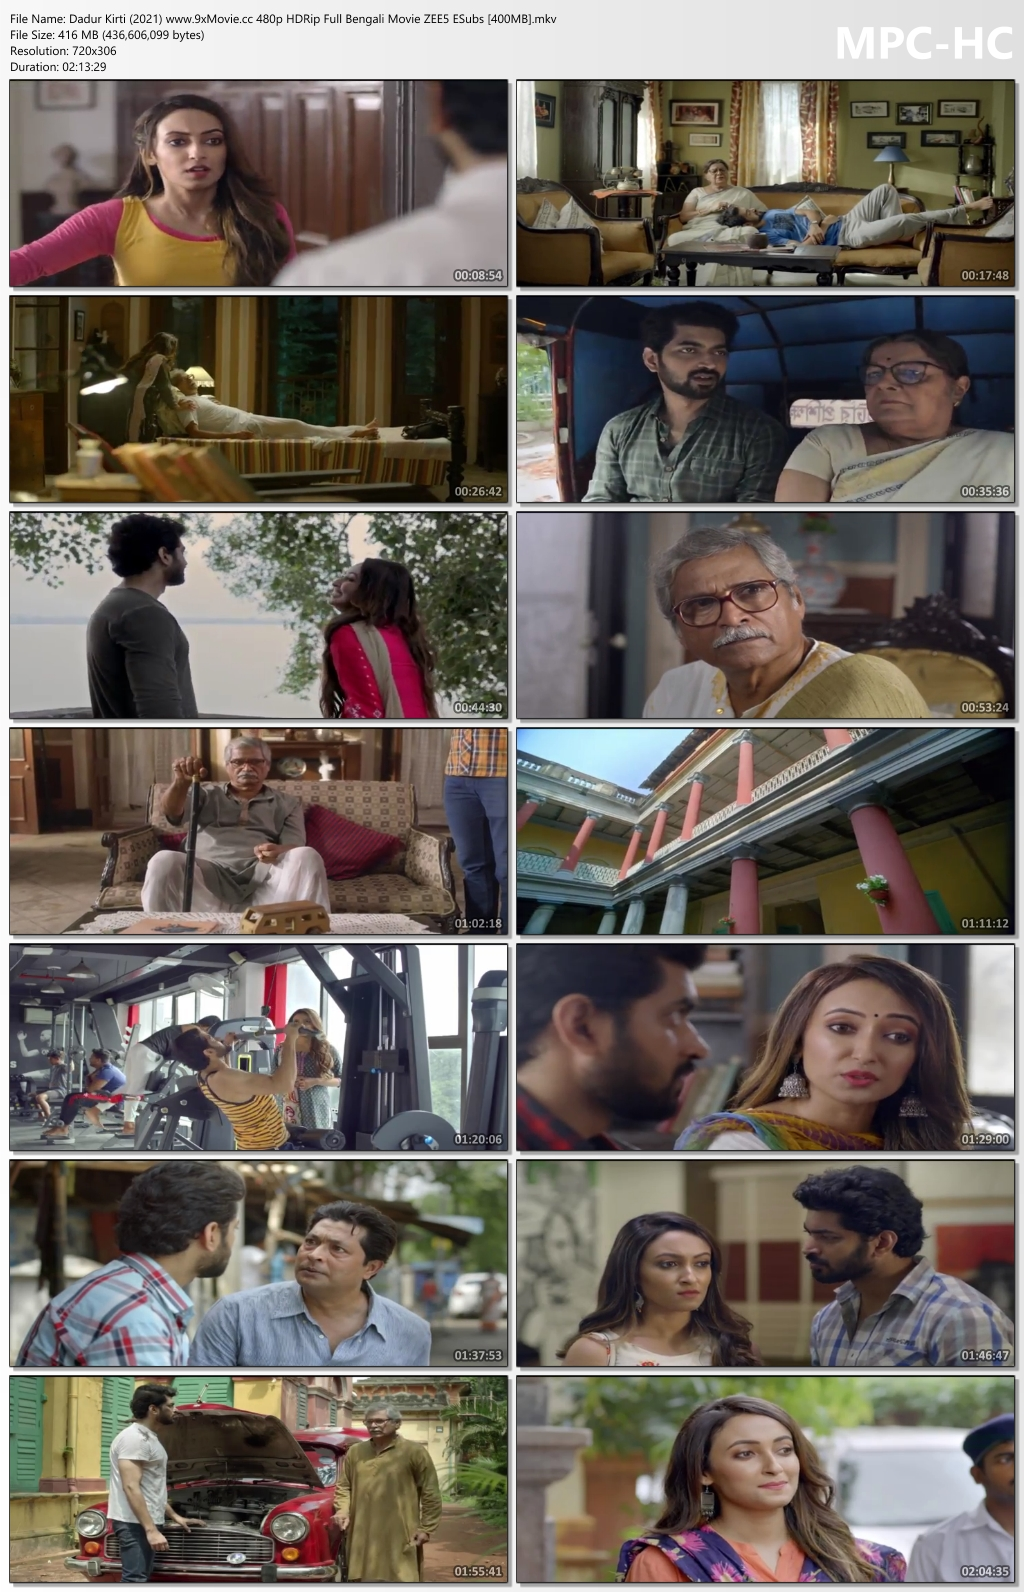 Dadur-Kirti-2021-www-9x-Movie-cc-480p-HDRip-Full-Bengali-Movie-ZEE5-ESubs-400-MB-mkv